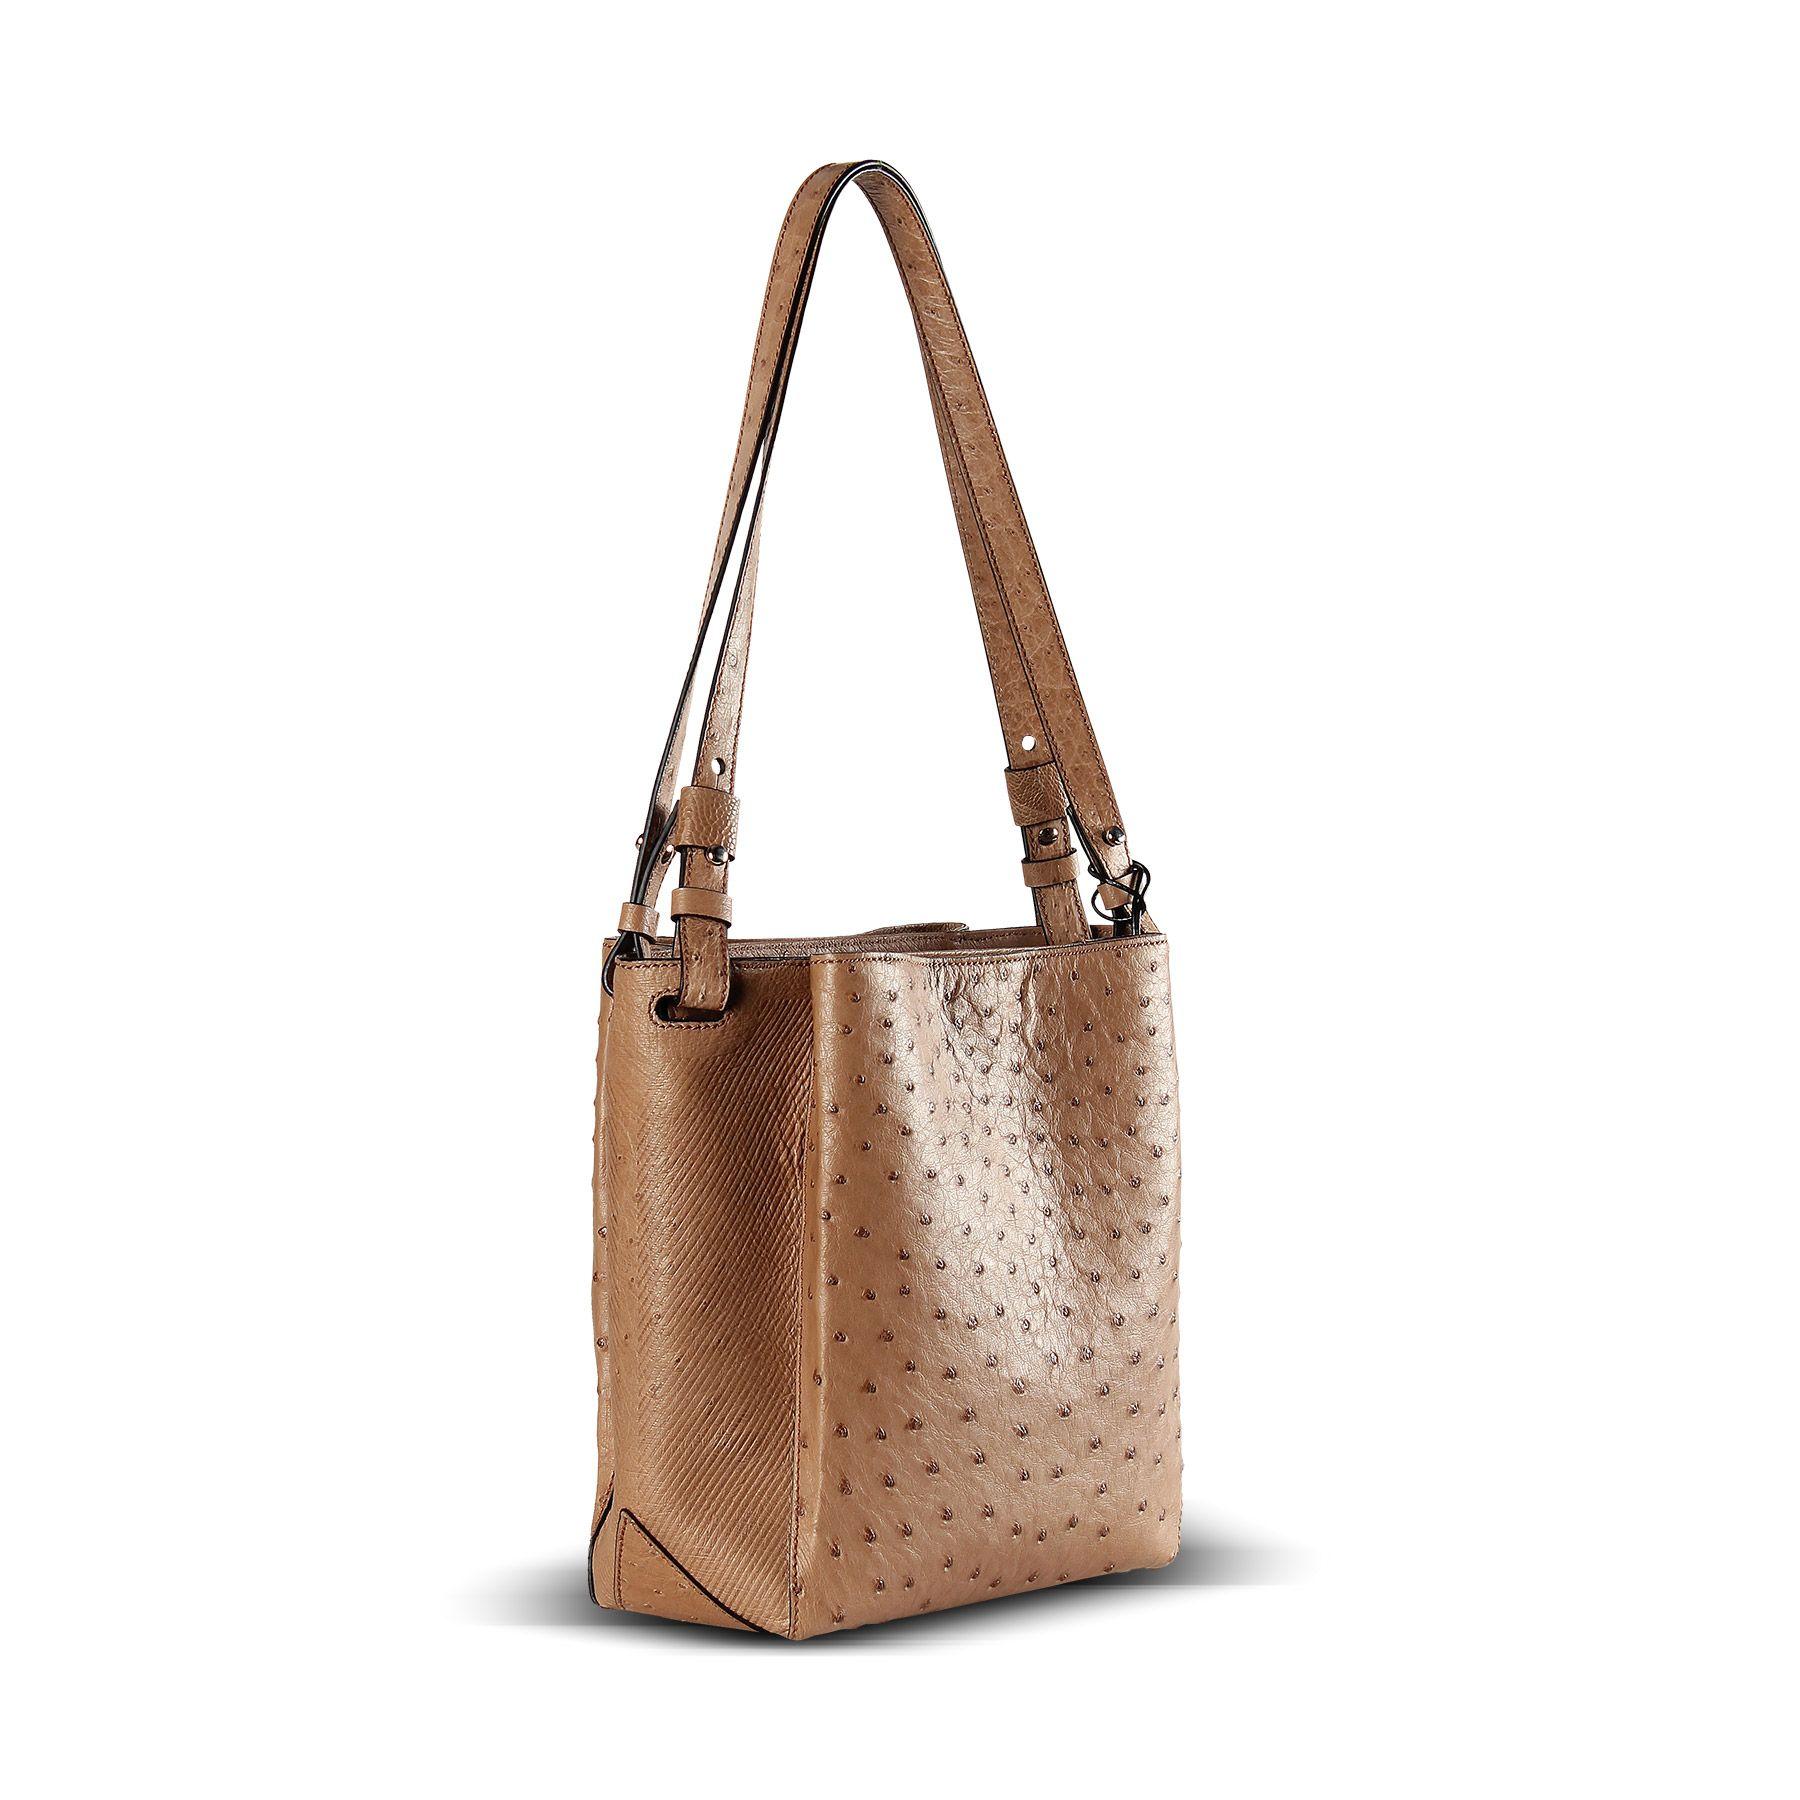 Genuine Ostrich Leather Handbag From Via Veneta Provoque Part Of The La Moda Group